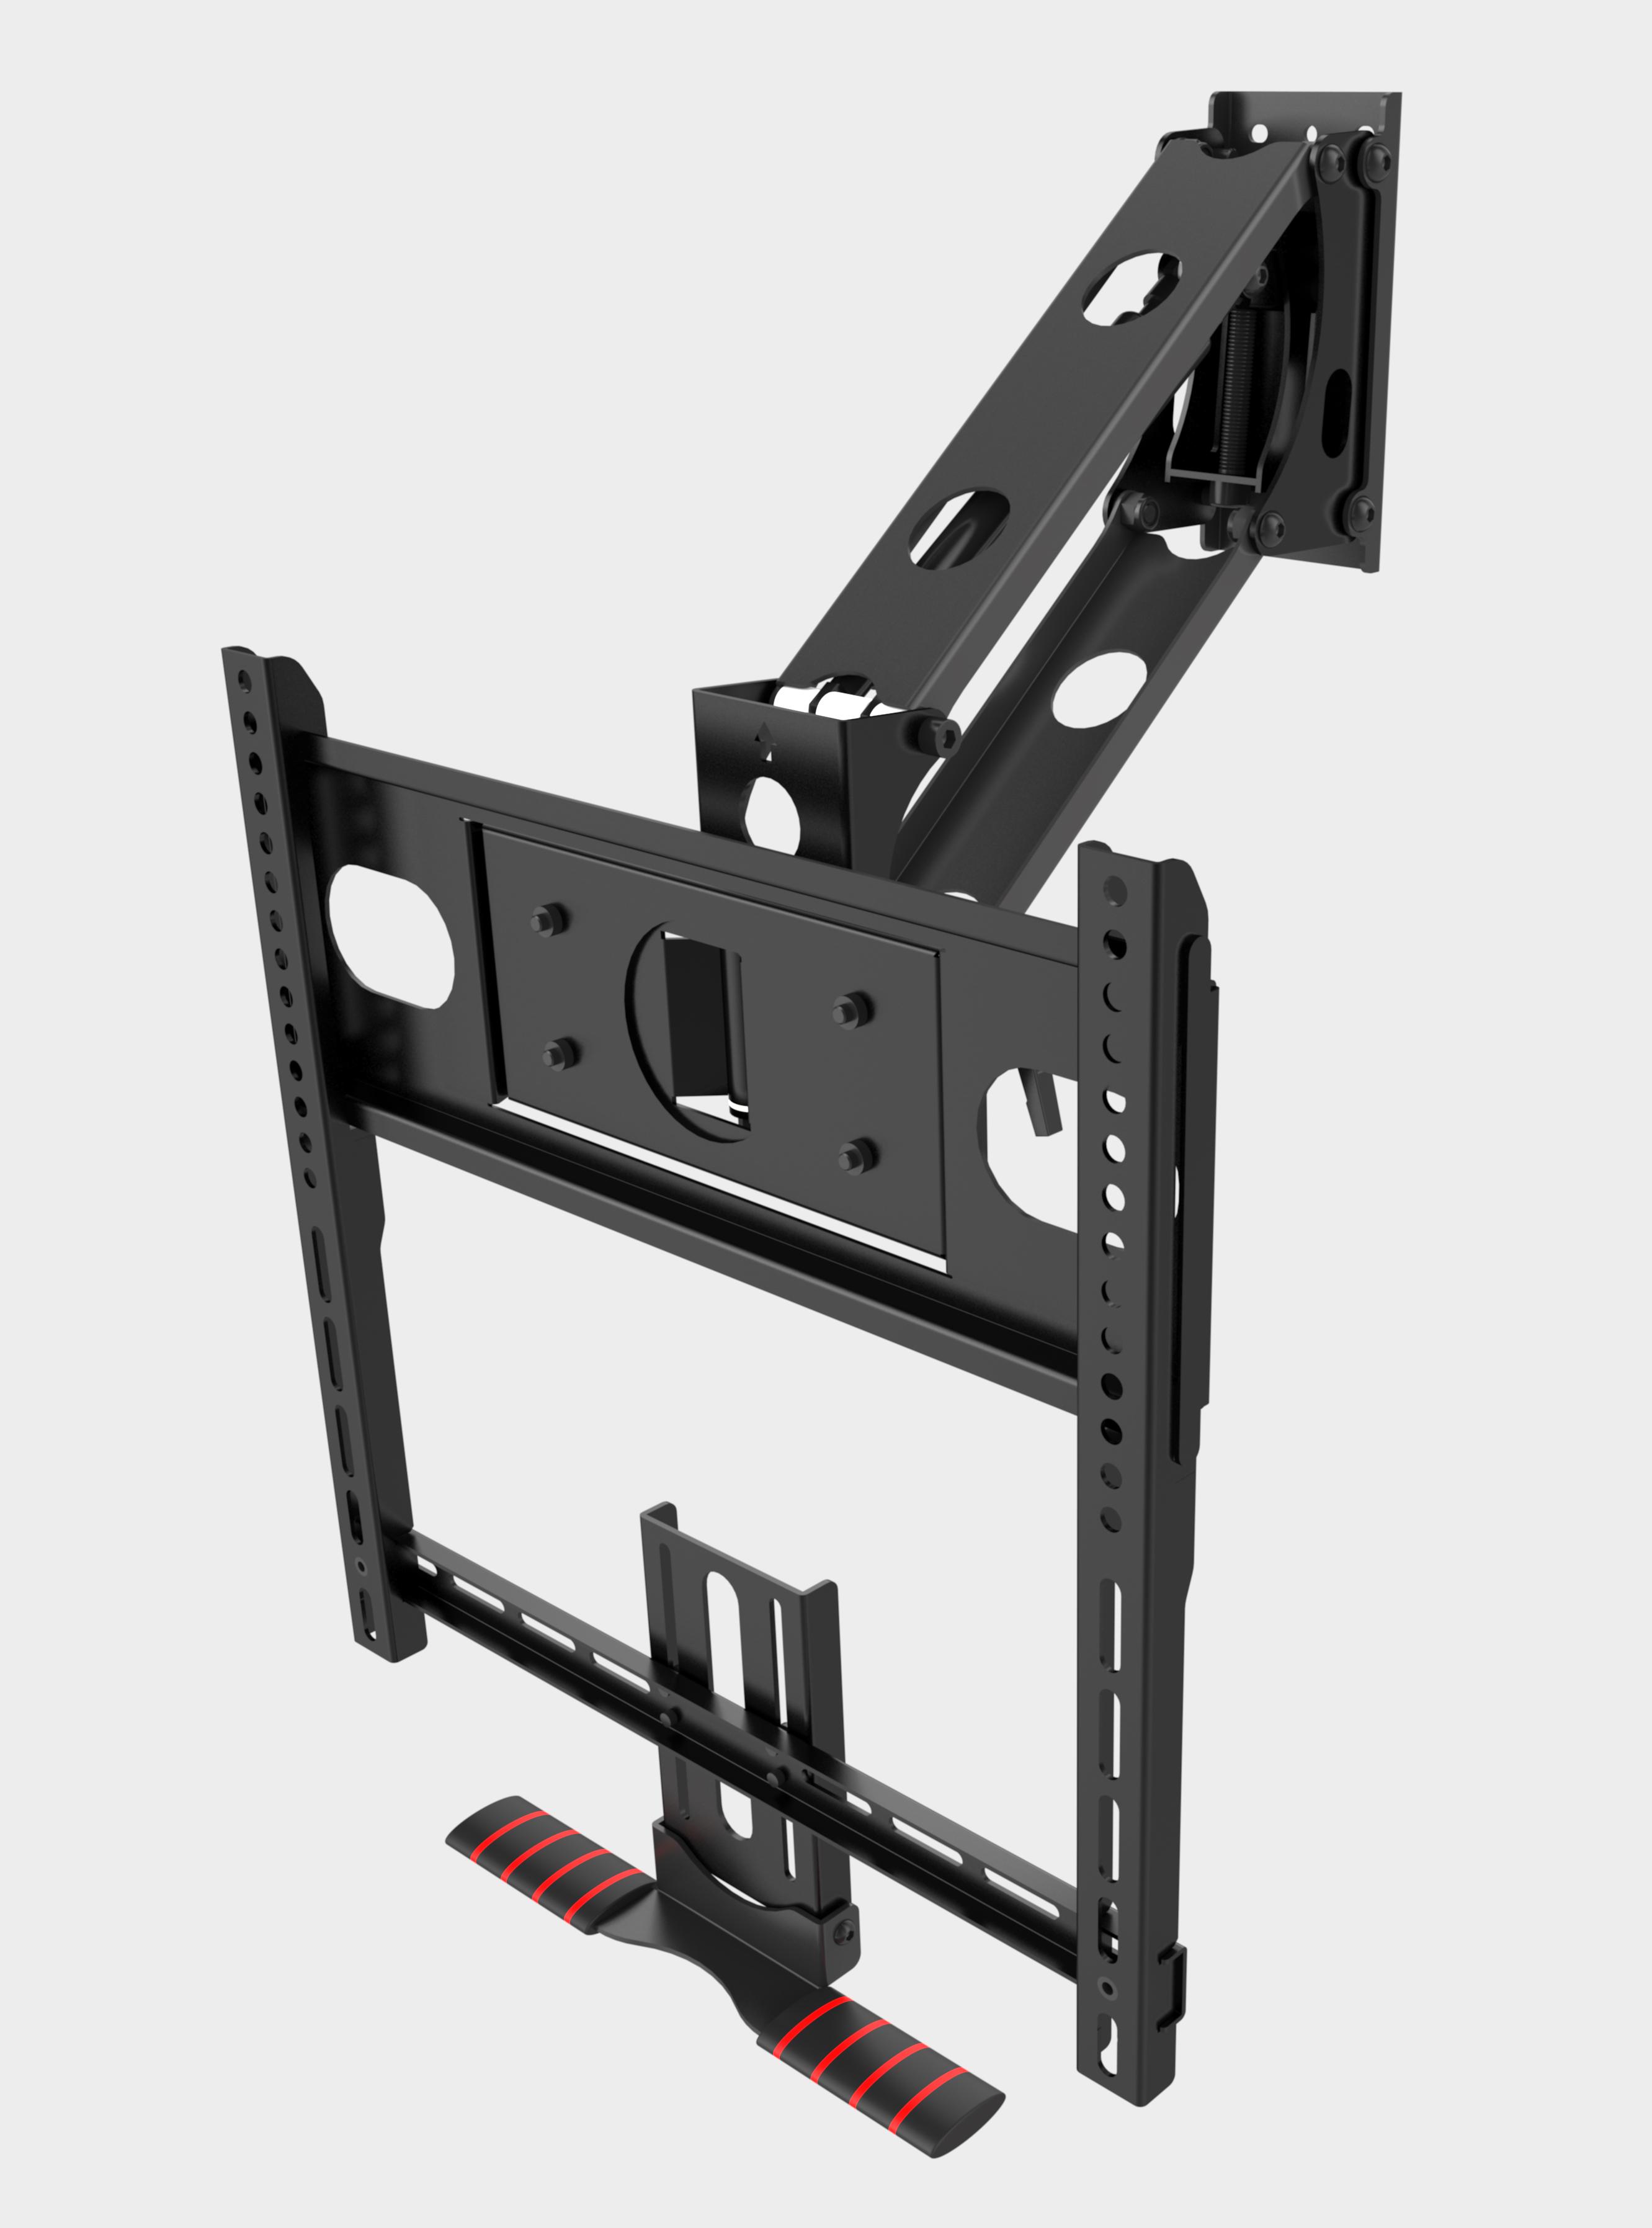 tranquilmount uk tmo400a full motion pull down swivel tv mount. Black Bedroom Furniture Sets. Home Design Ideas